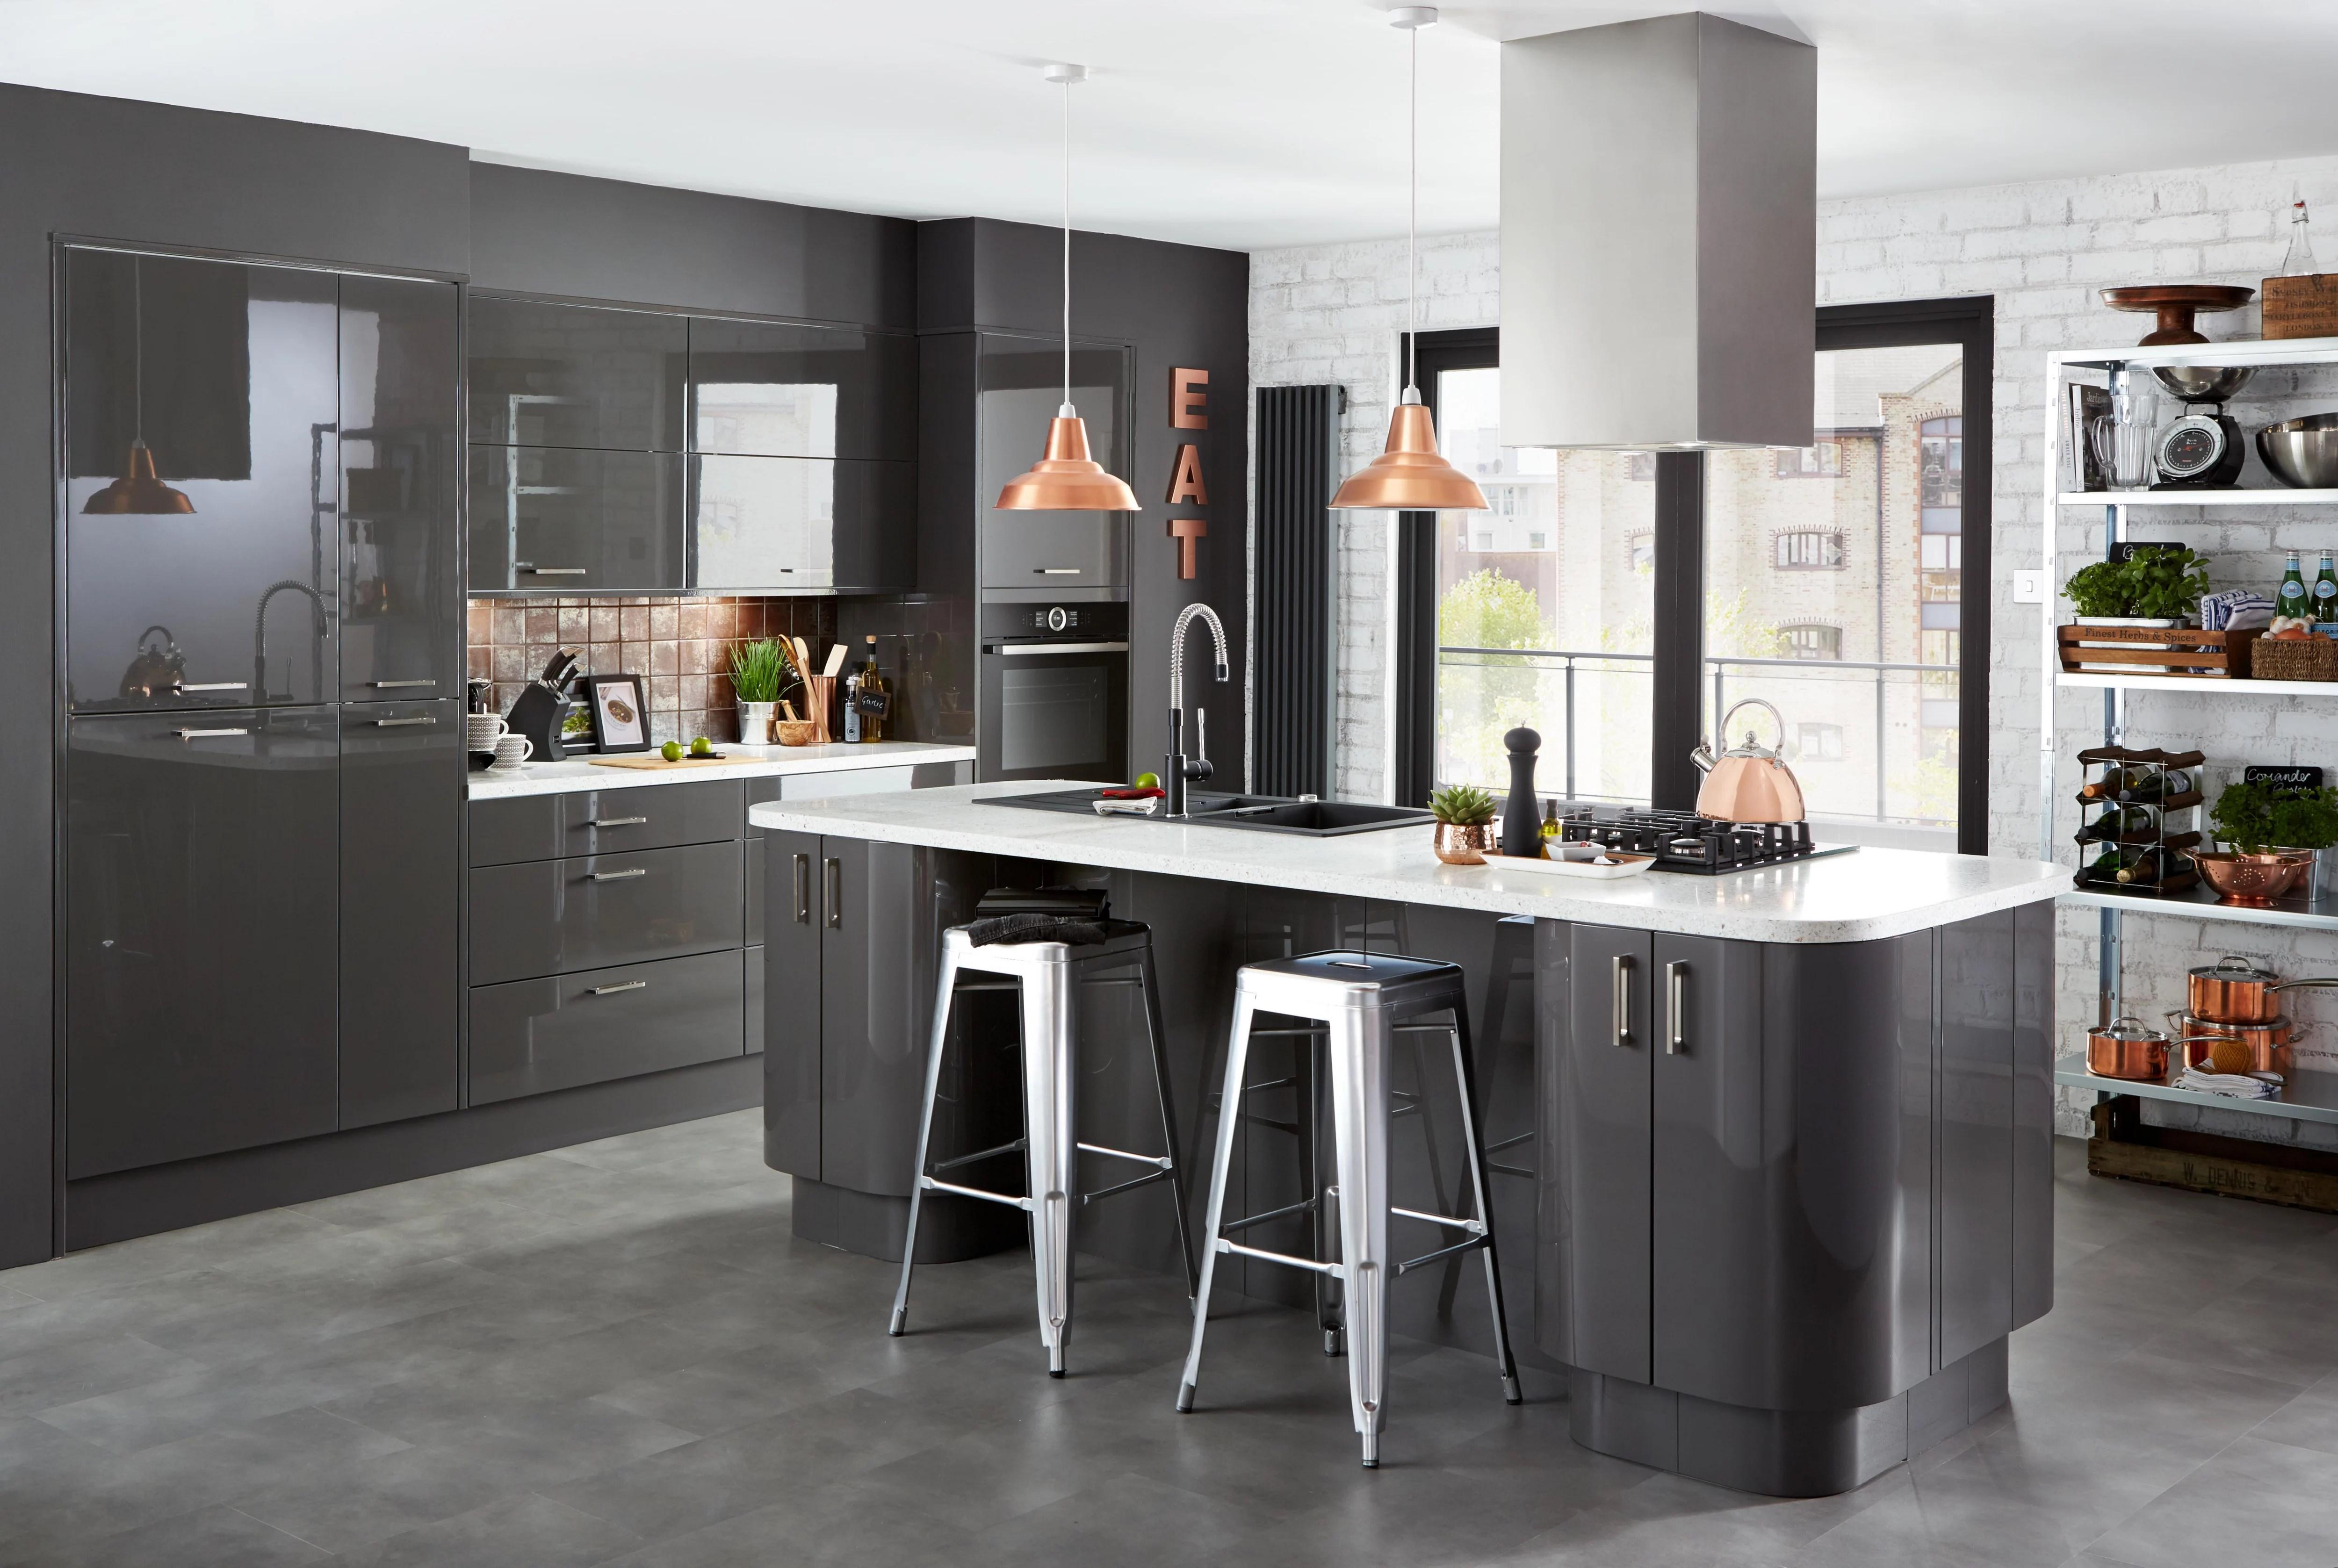 kitchen corner cabinets 3 piece bistro set contemporary design ideas | & advice diy ...